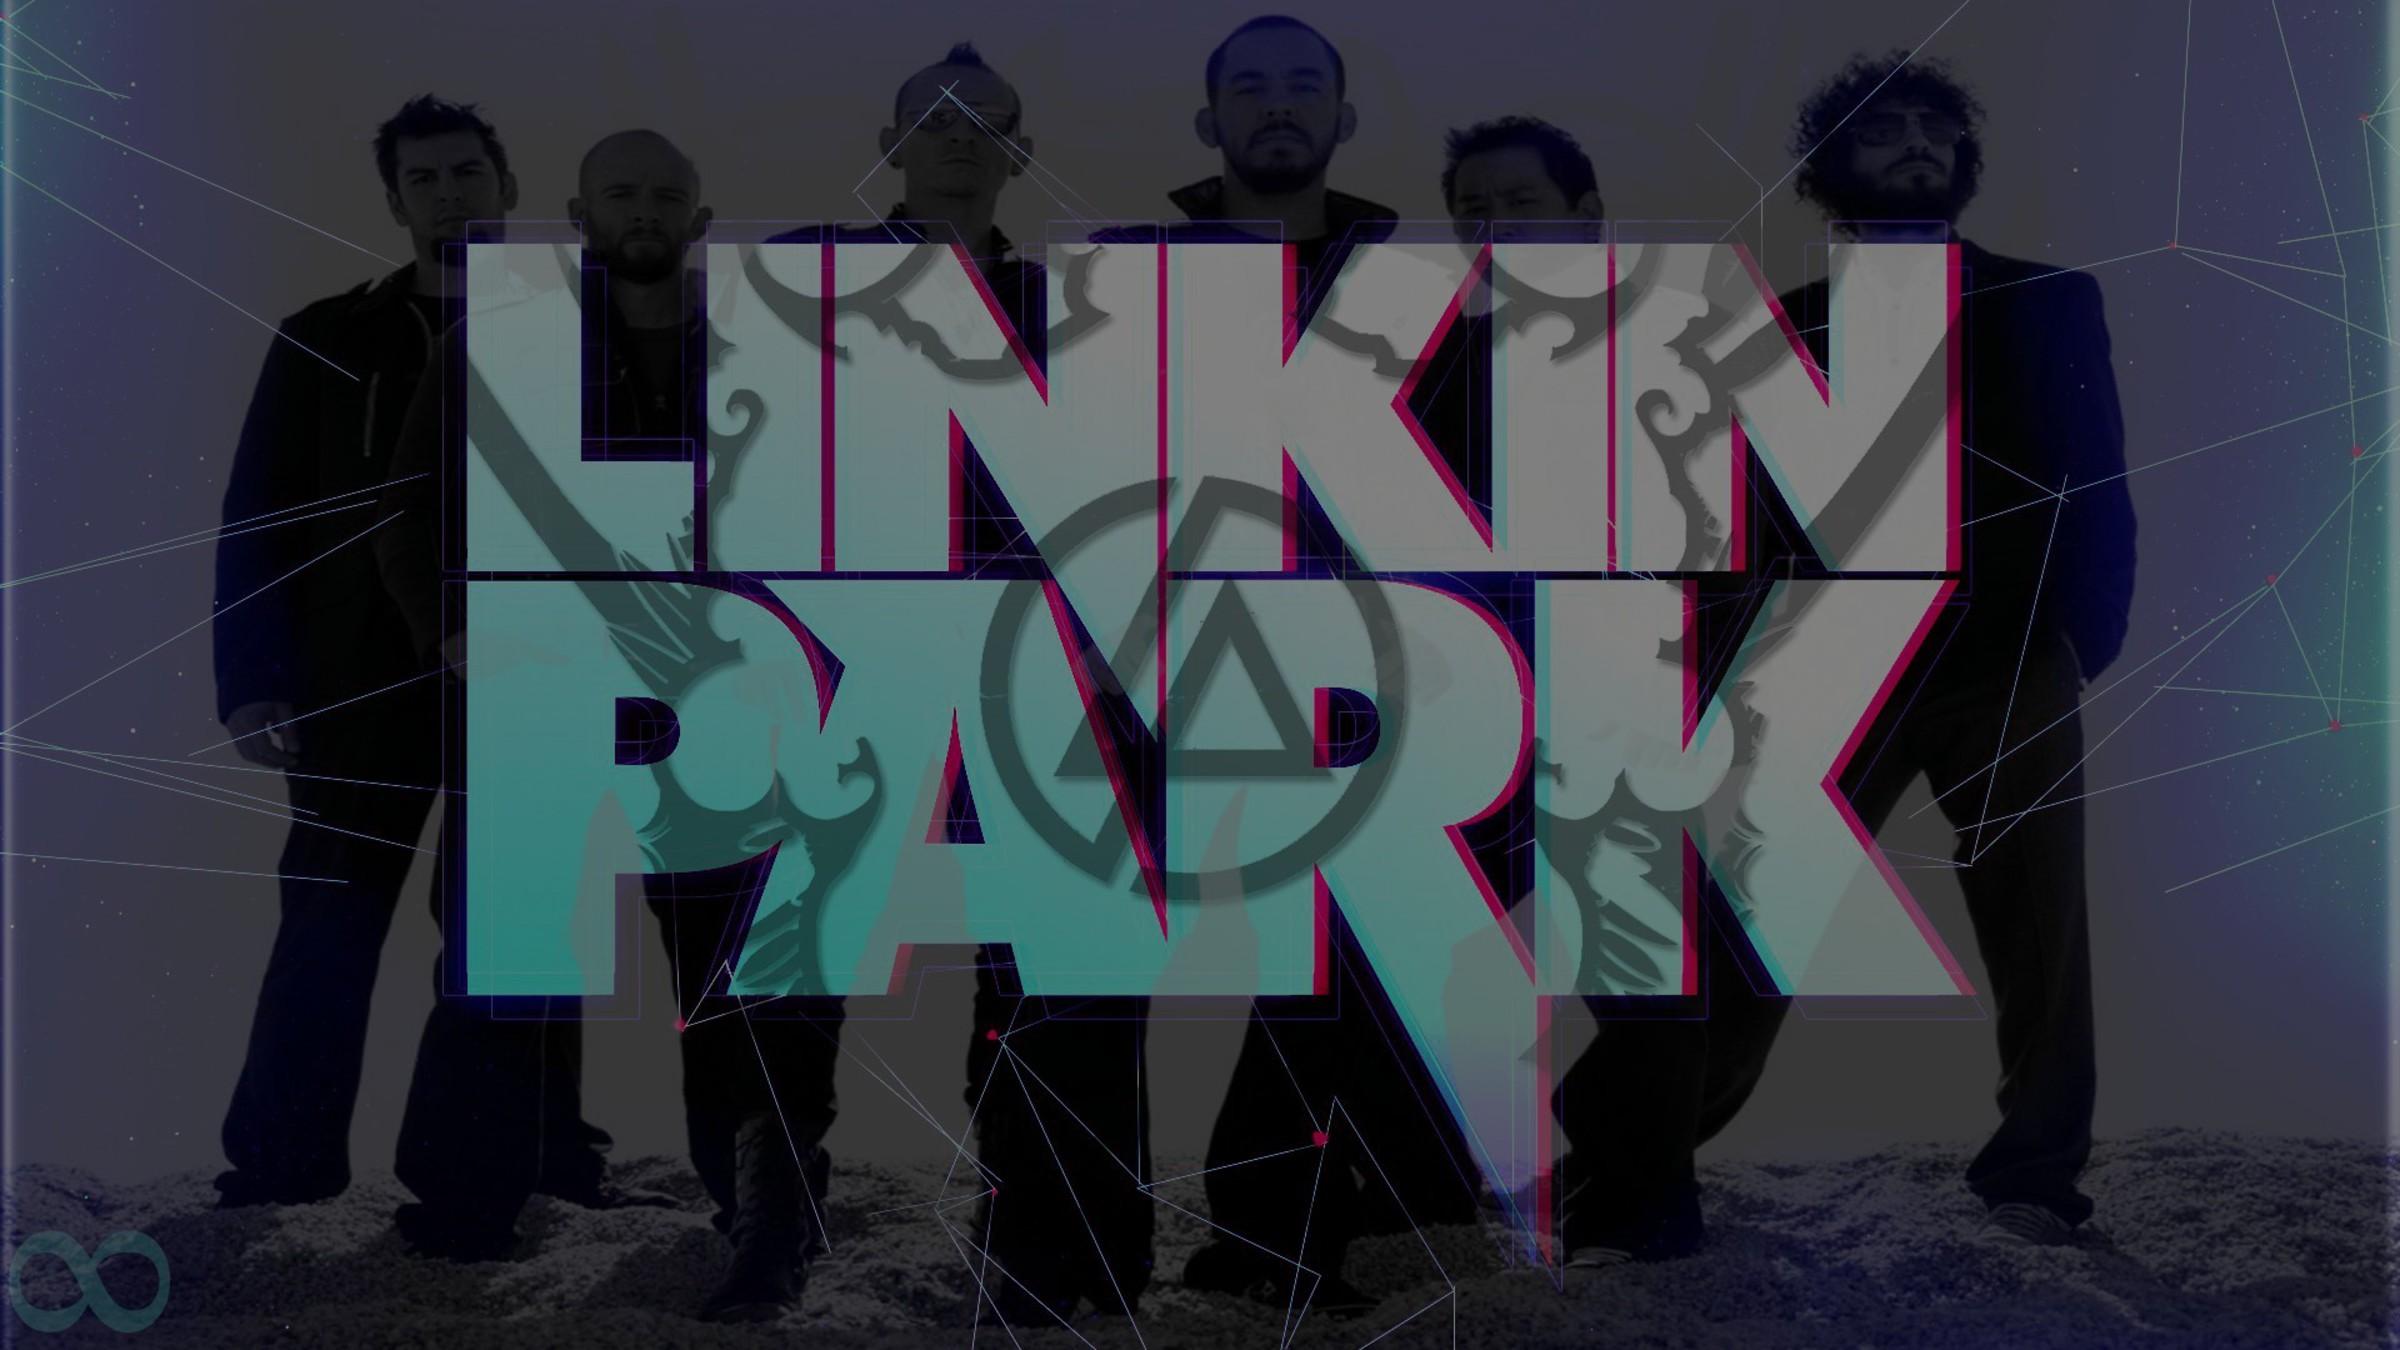 park-mike-shinoda-rock-music-rob-bourdon-2400x1350-wallpaper